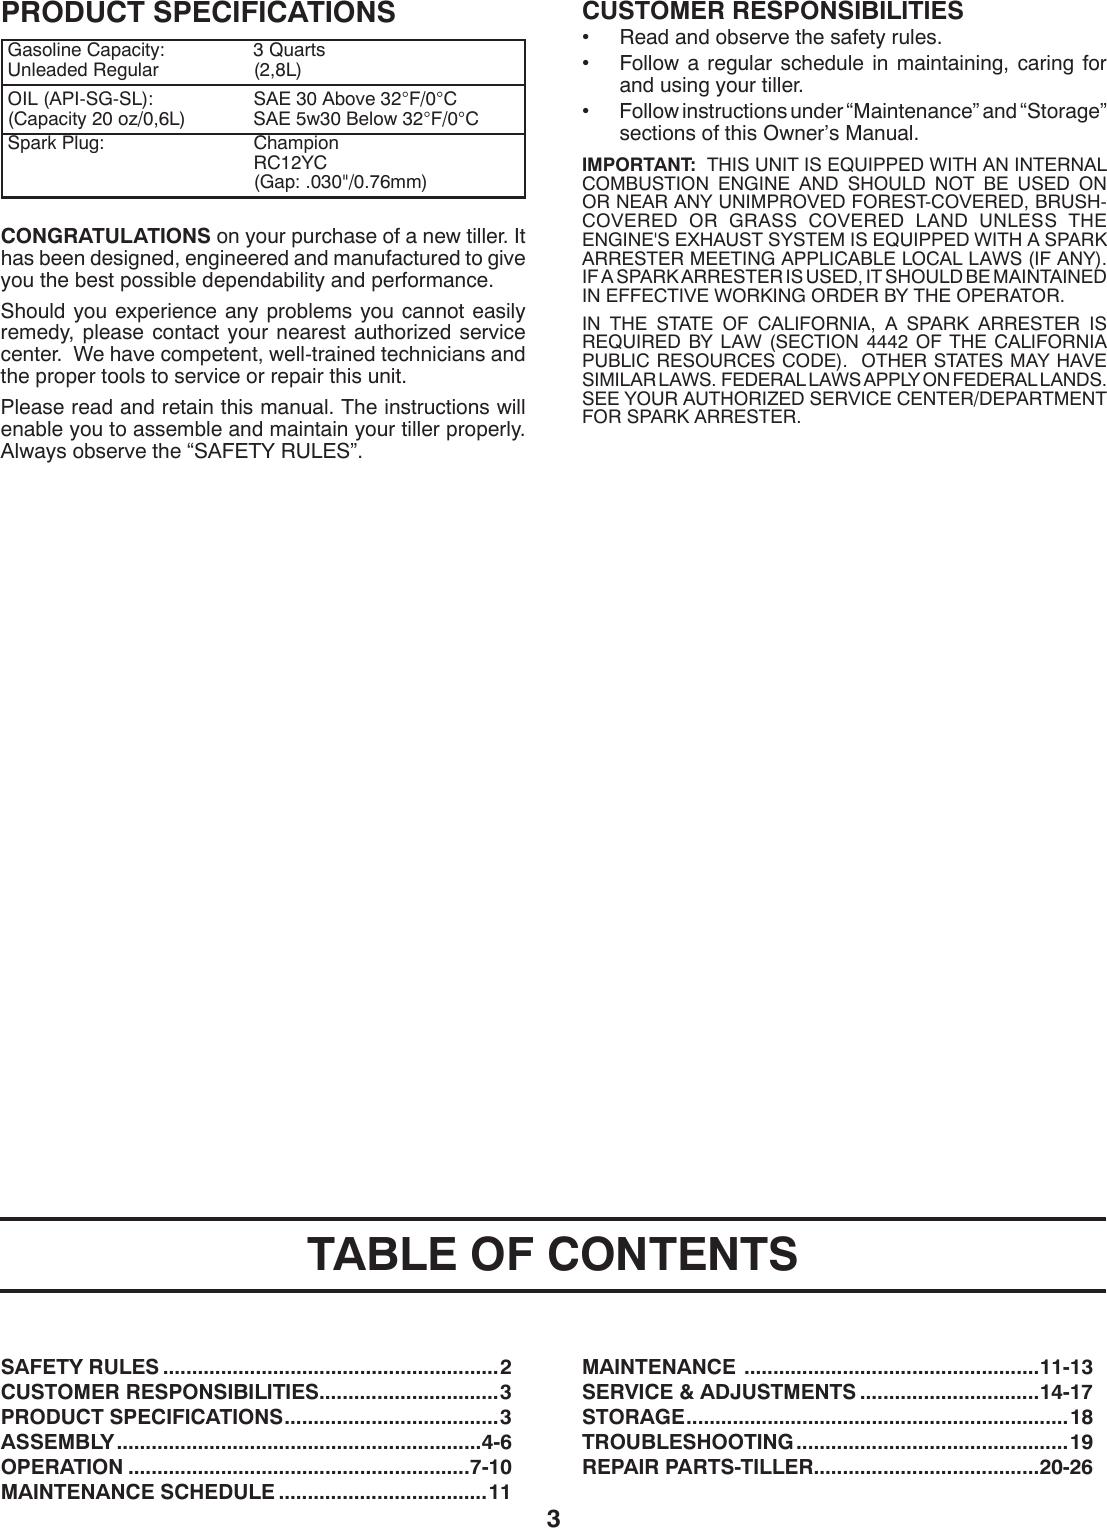 Husqvarna Crt1350Ls Users Manual OM, CRT1350LS, 2009 12